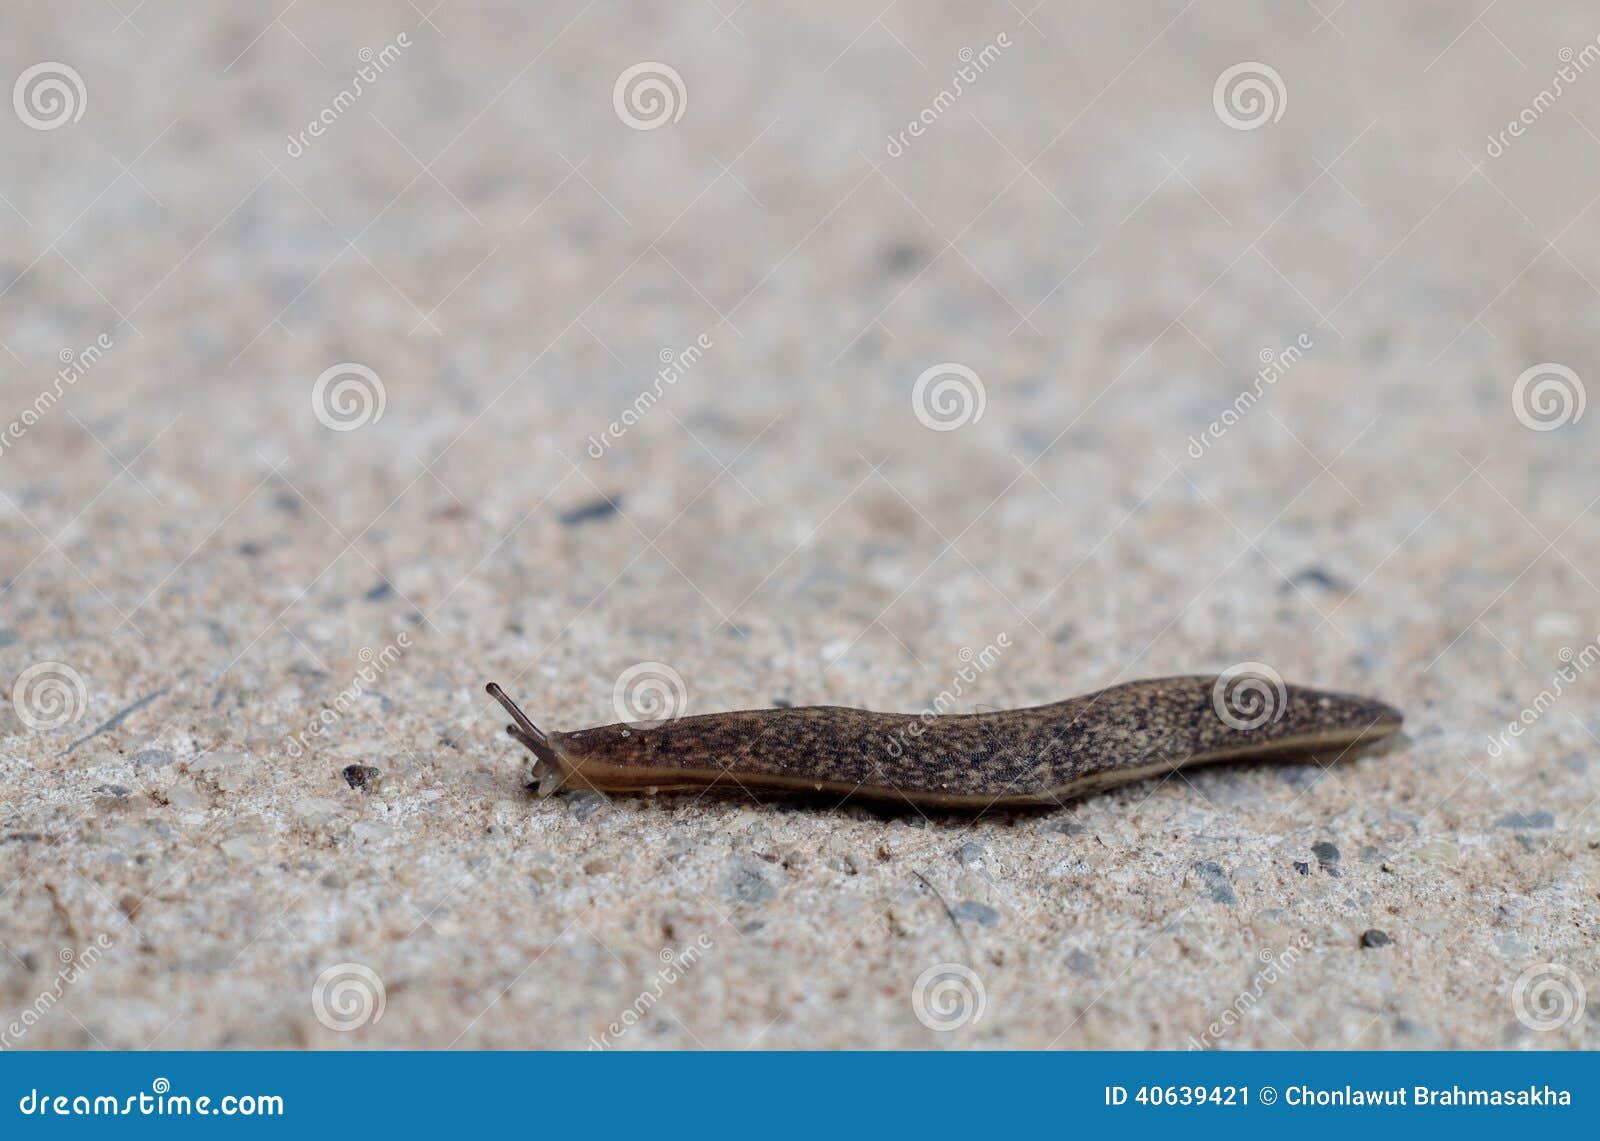 Slug On The Floor Stock Image Image Of Animal Move